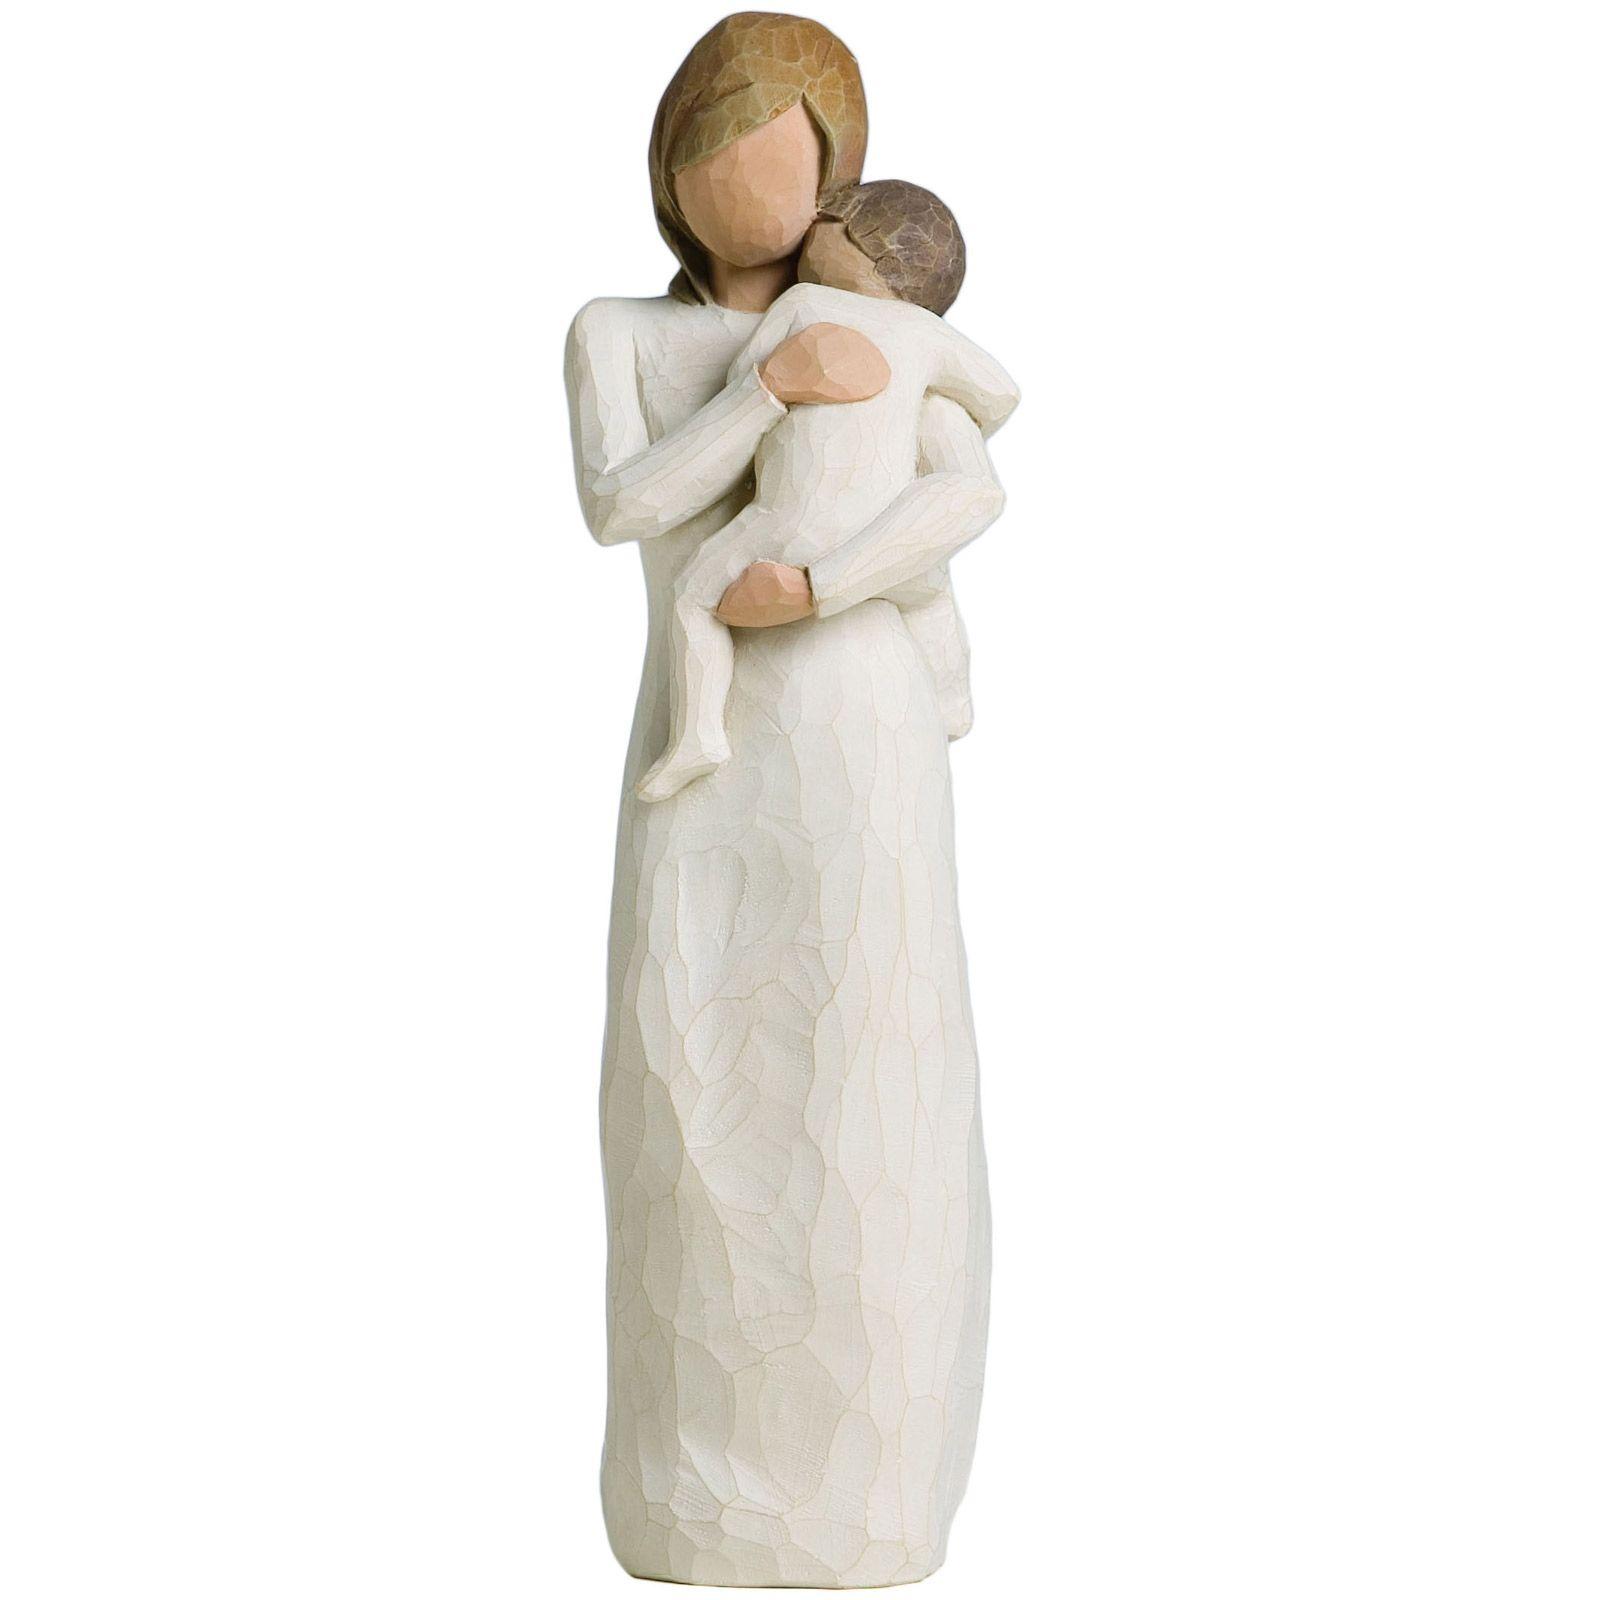 figurine enfant de mon c ur willow tree figurine. Black Bedroom Furniture Sets. Home Design Ideas